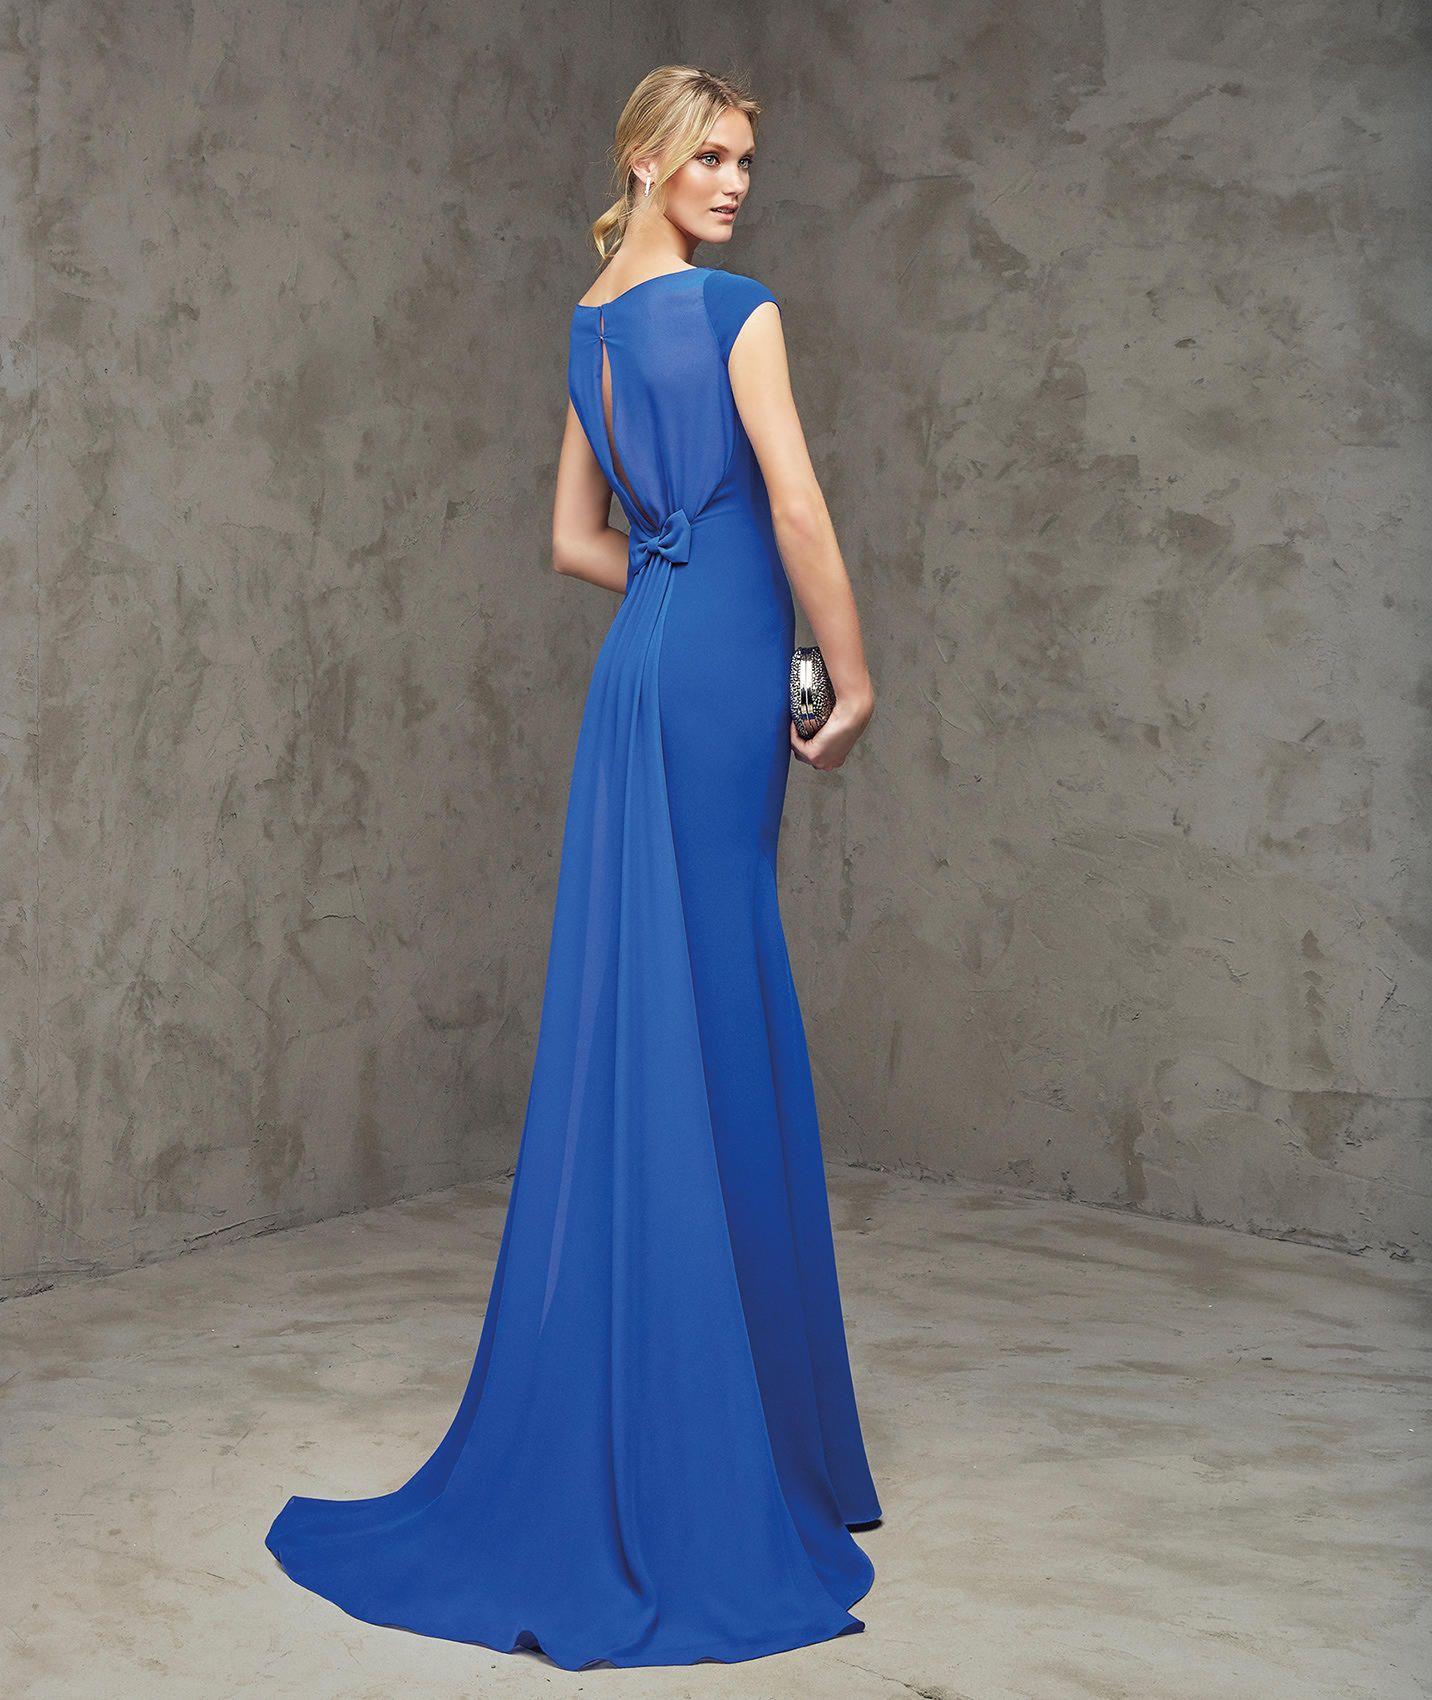 af7a7d4b0 FLEUR - Vestido de fiesta largo azul